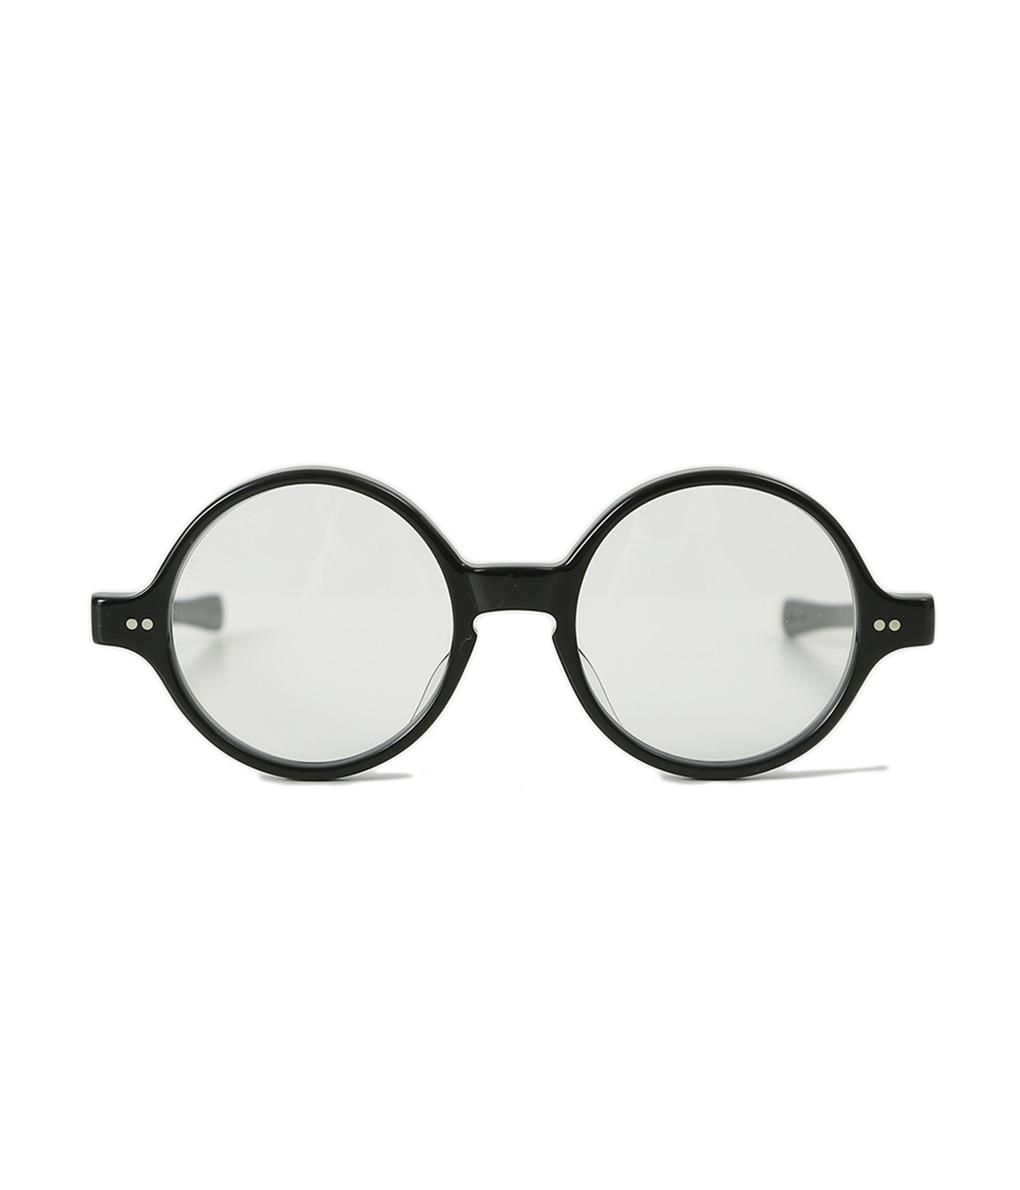 JULIUS TART OPTICAL / ジュリアスタートオプティカル : T-ROUND 46-19 48-21 -BLACK/CLEAR- : サングラス アクセサリー メガネ 眼鏡 アイウェア : JTPL-016A-7A-wise【WIS】